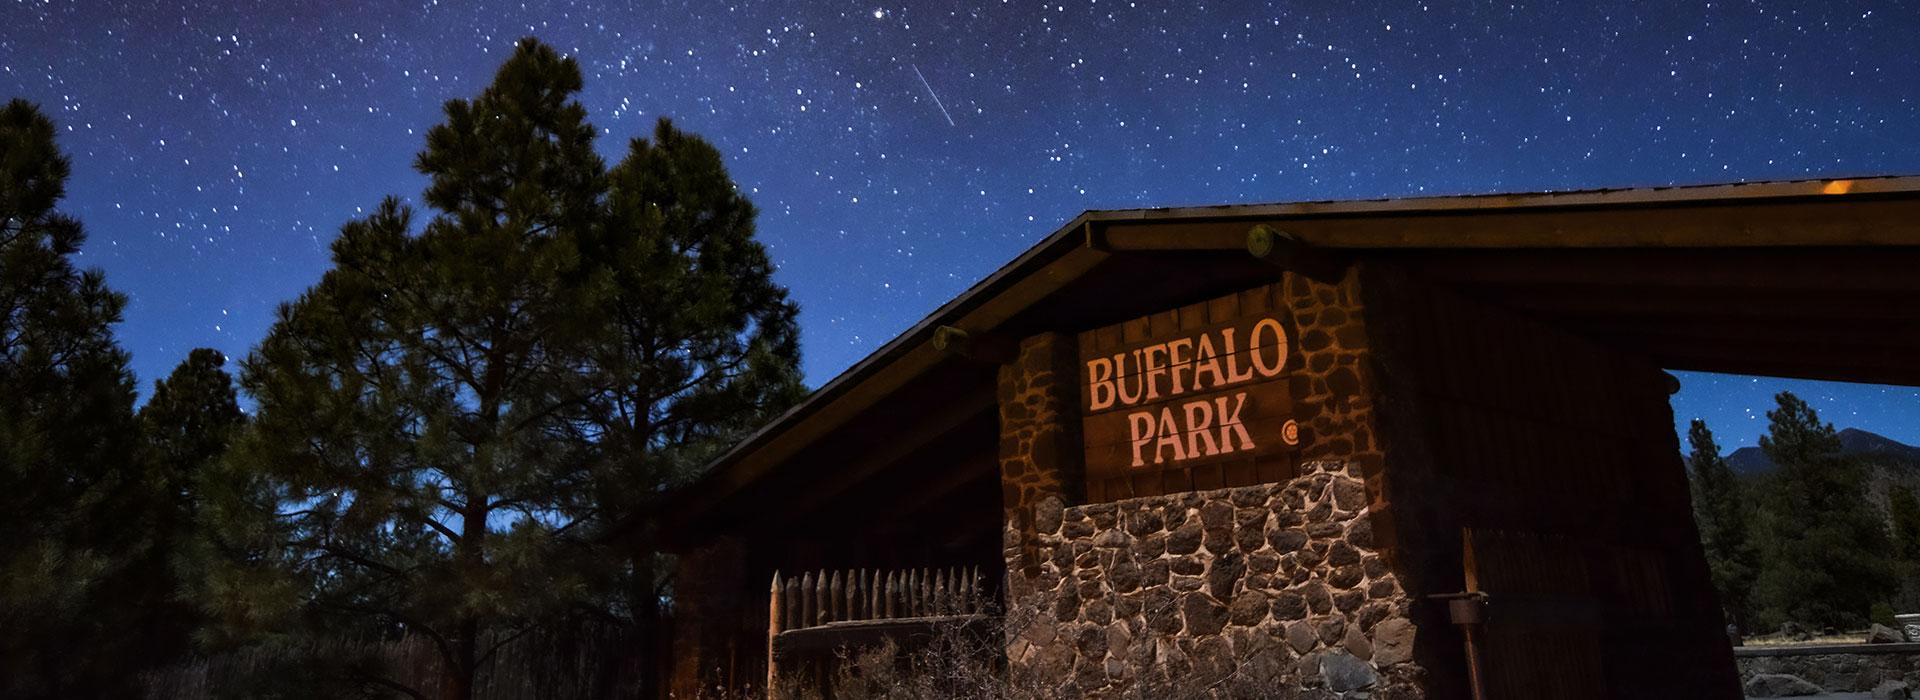 Buffalo Park